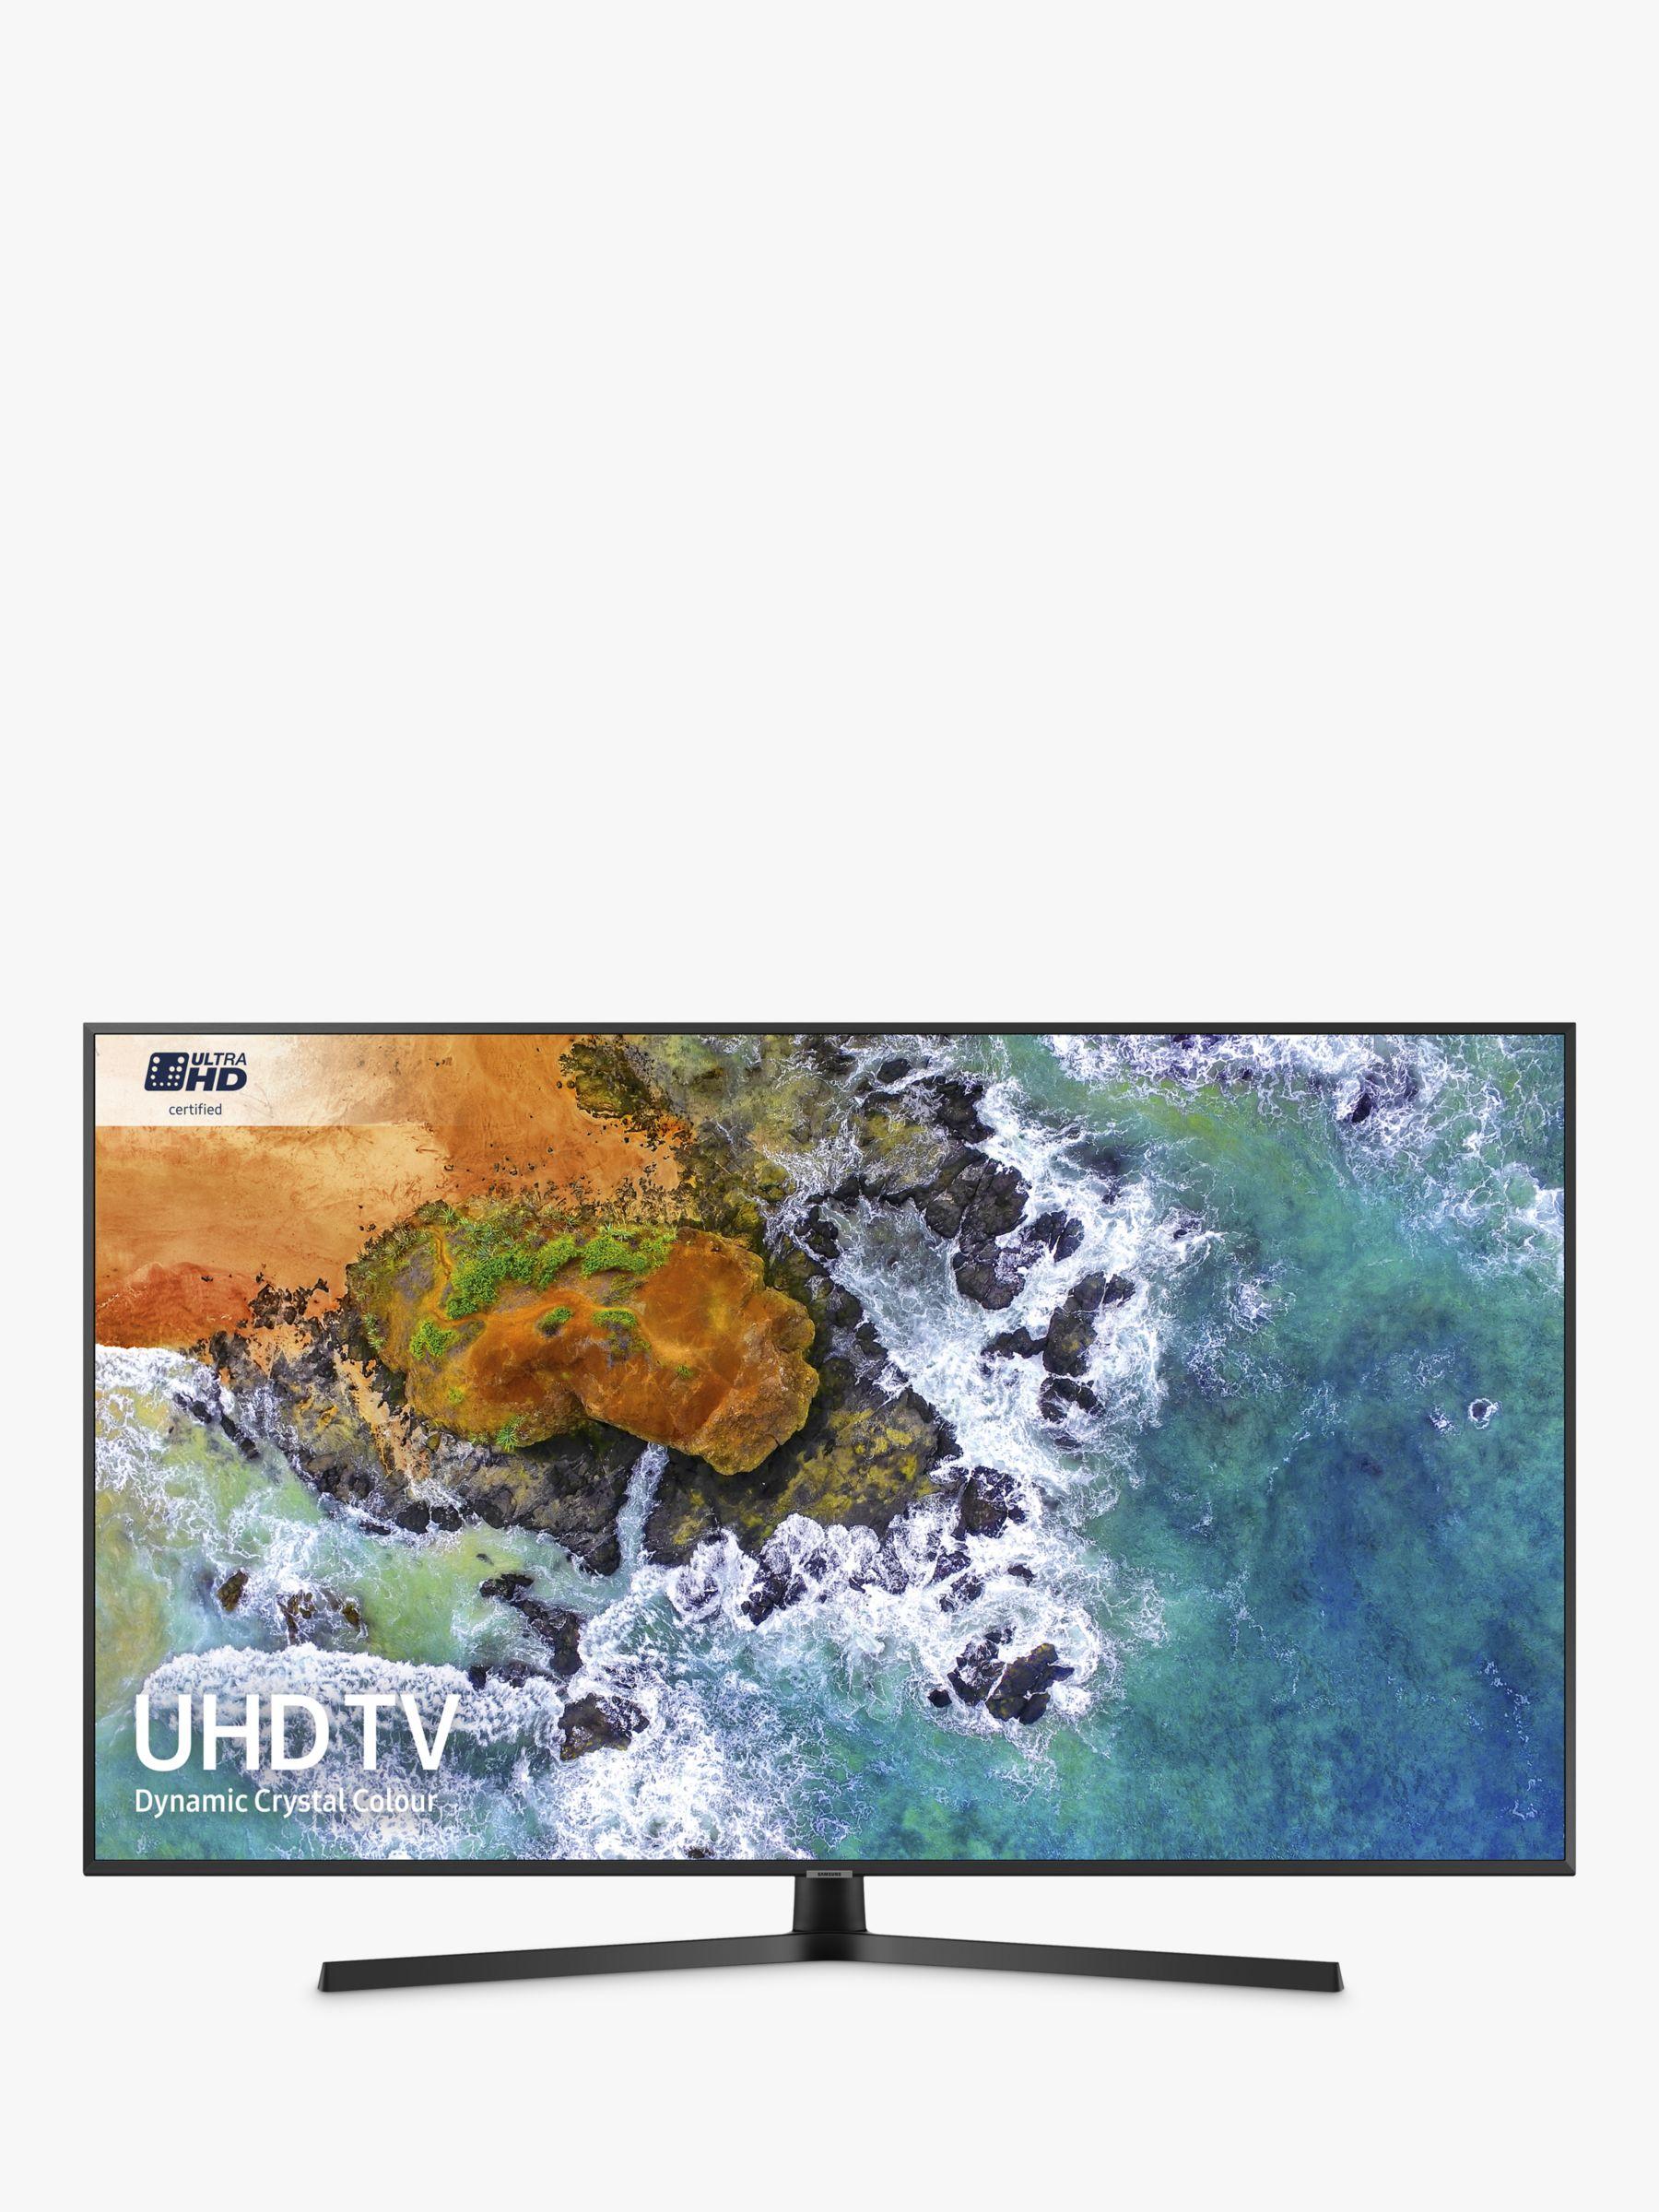 Samsung UE43NU7400 HDR 4K Ultra HD Smart TV, 43